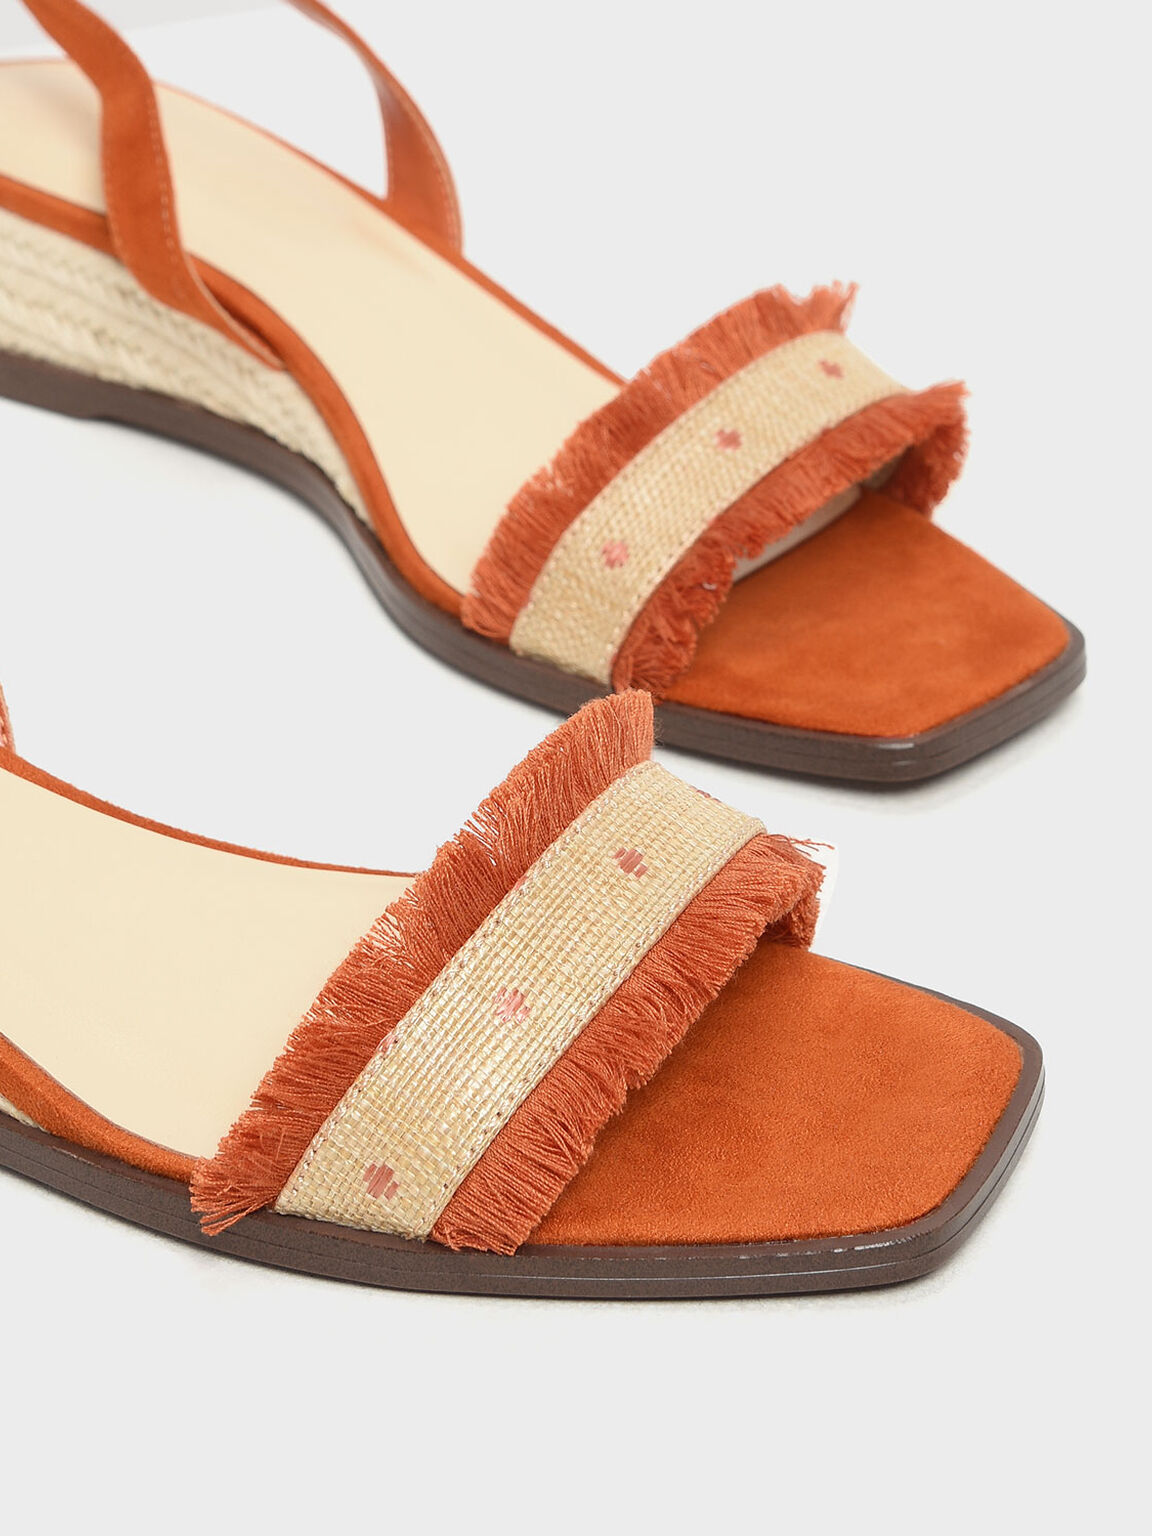 Raffia Lace-Up Espadrille Wedges, Orange, hi-res